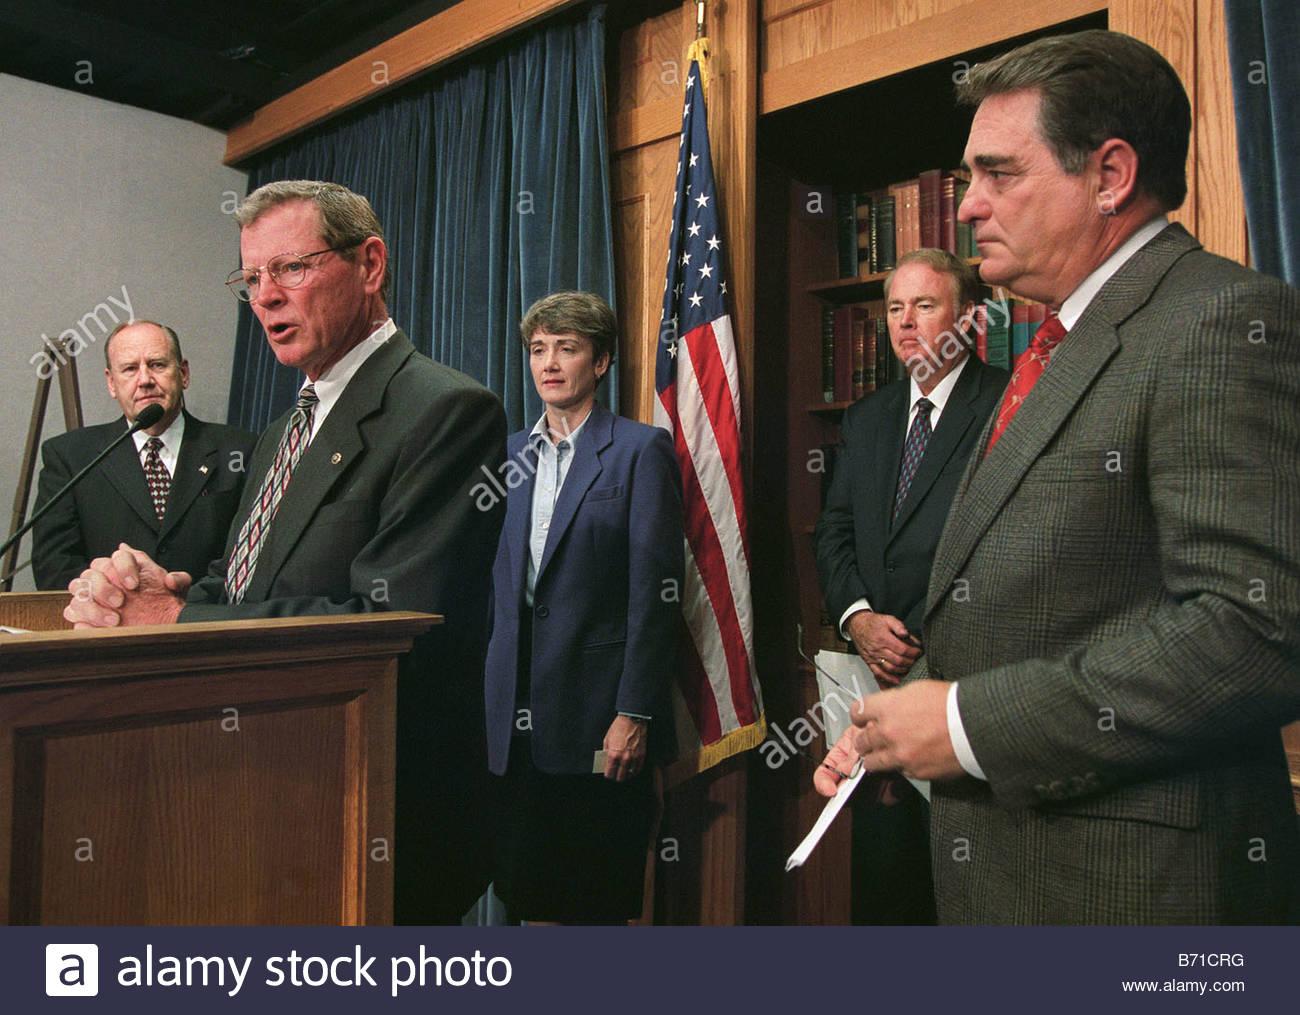 11 28 01 ENERGY BILL House Resources Chairman James V Hansen R Utah Senate  Environment And Public Works Member Sen James M Inhofe R Okla Speaking  Heather A ...